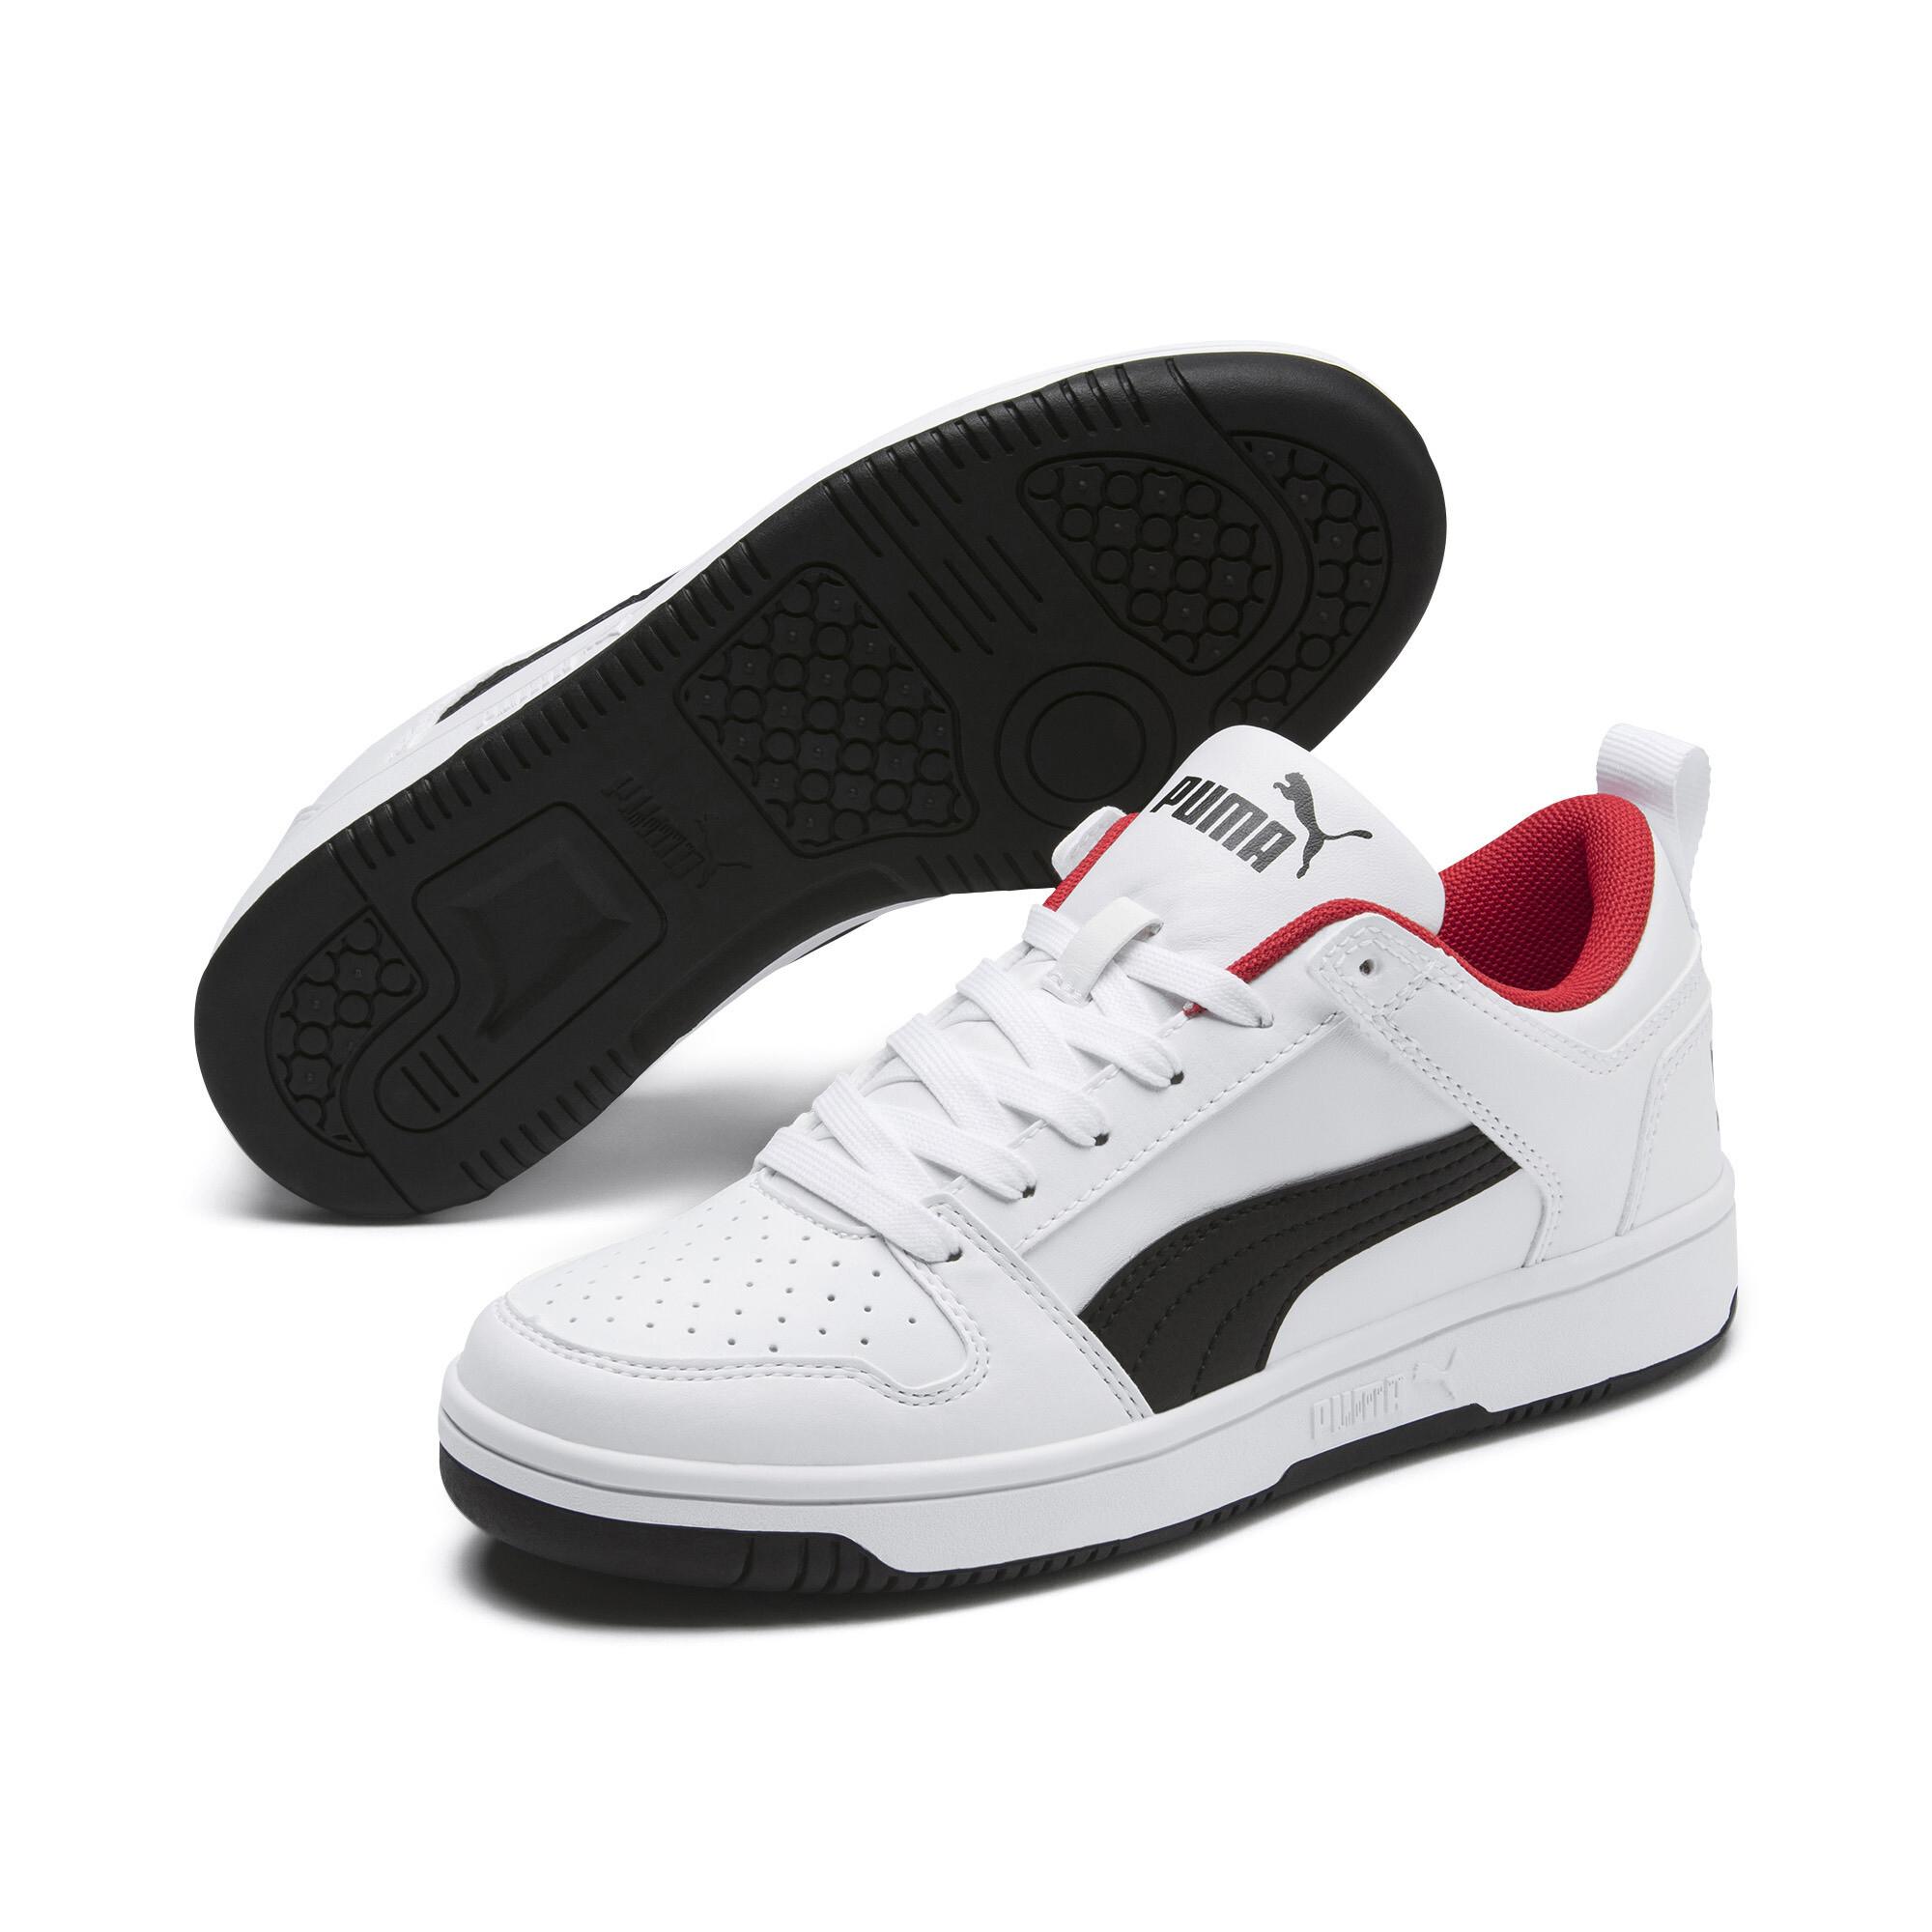 0eeba92b41 PUMA PUMA Rebound LayUp Lo Sneakers JR Kids Shoe Kids